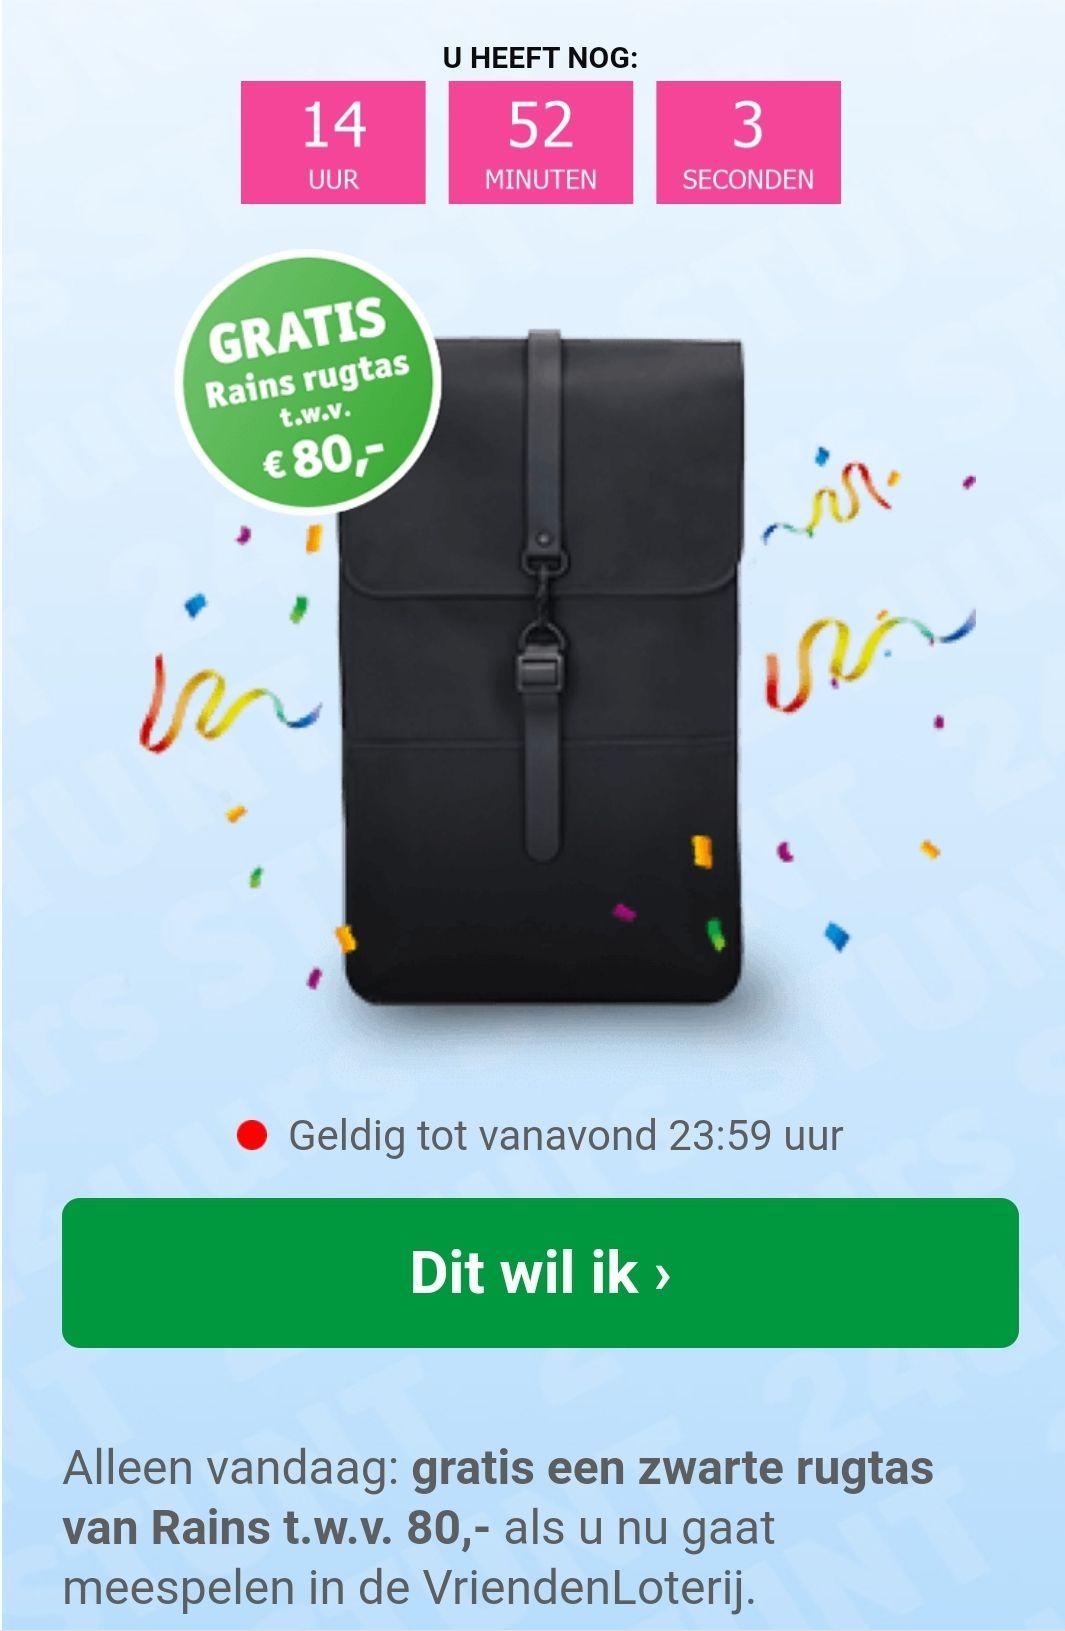 'Gratis' (bij 1 lot à €13,75) Rains ras t.w.v. € 80